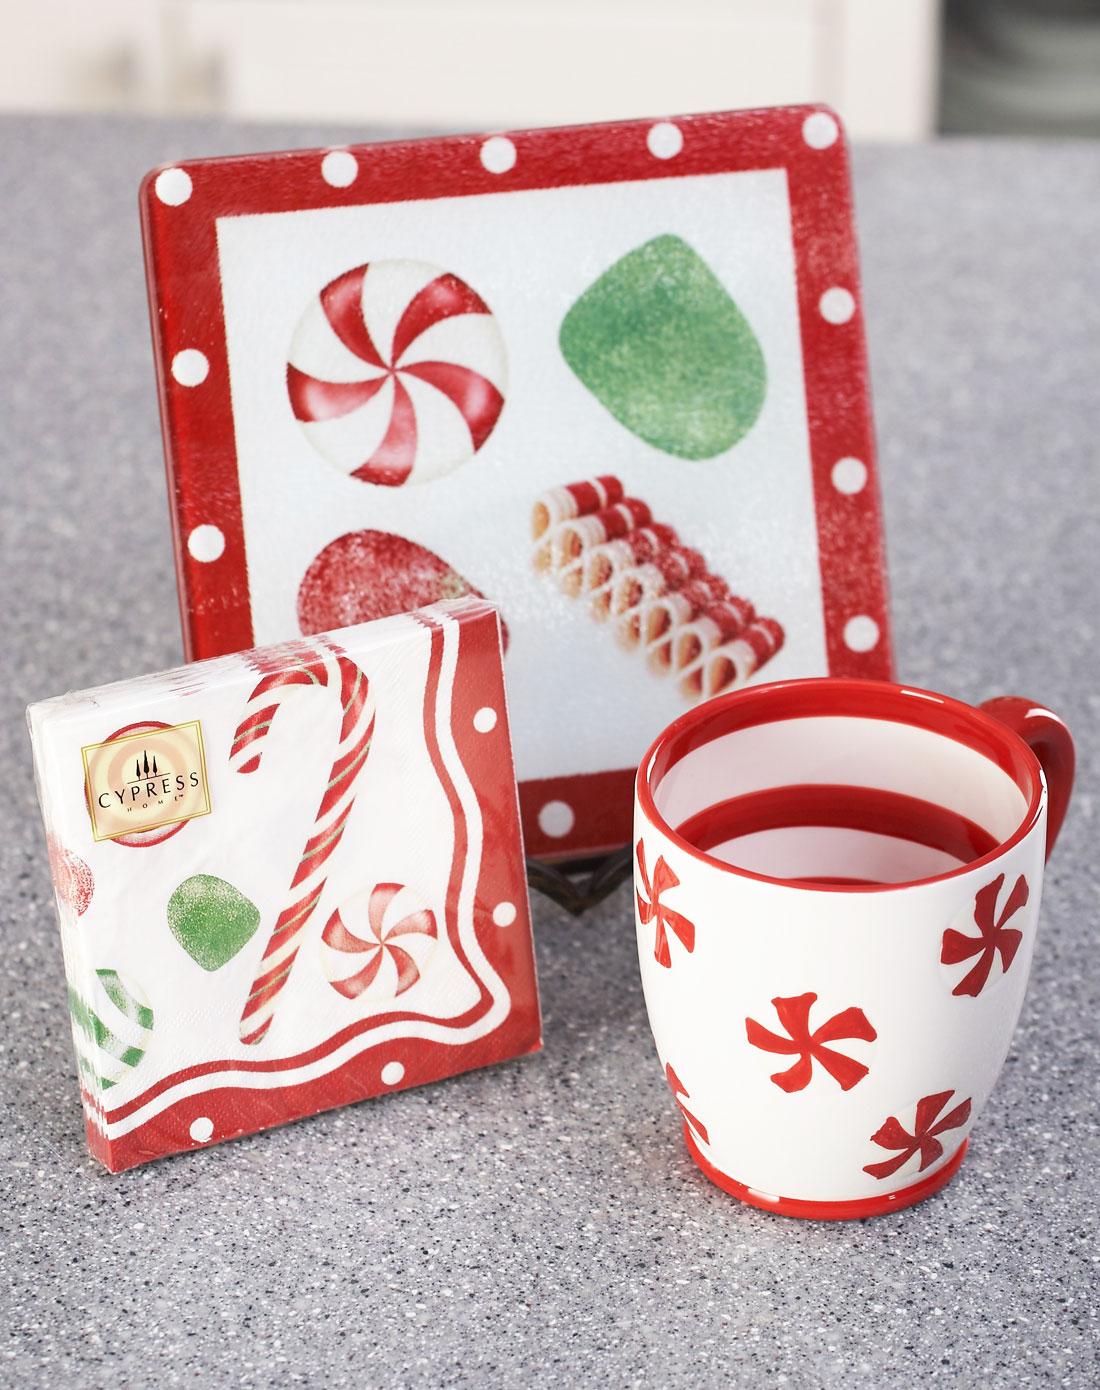 evergreen家居用品专场手绘马克杯+茶点板+印花纸巾